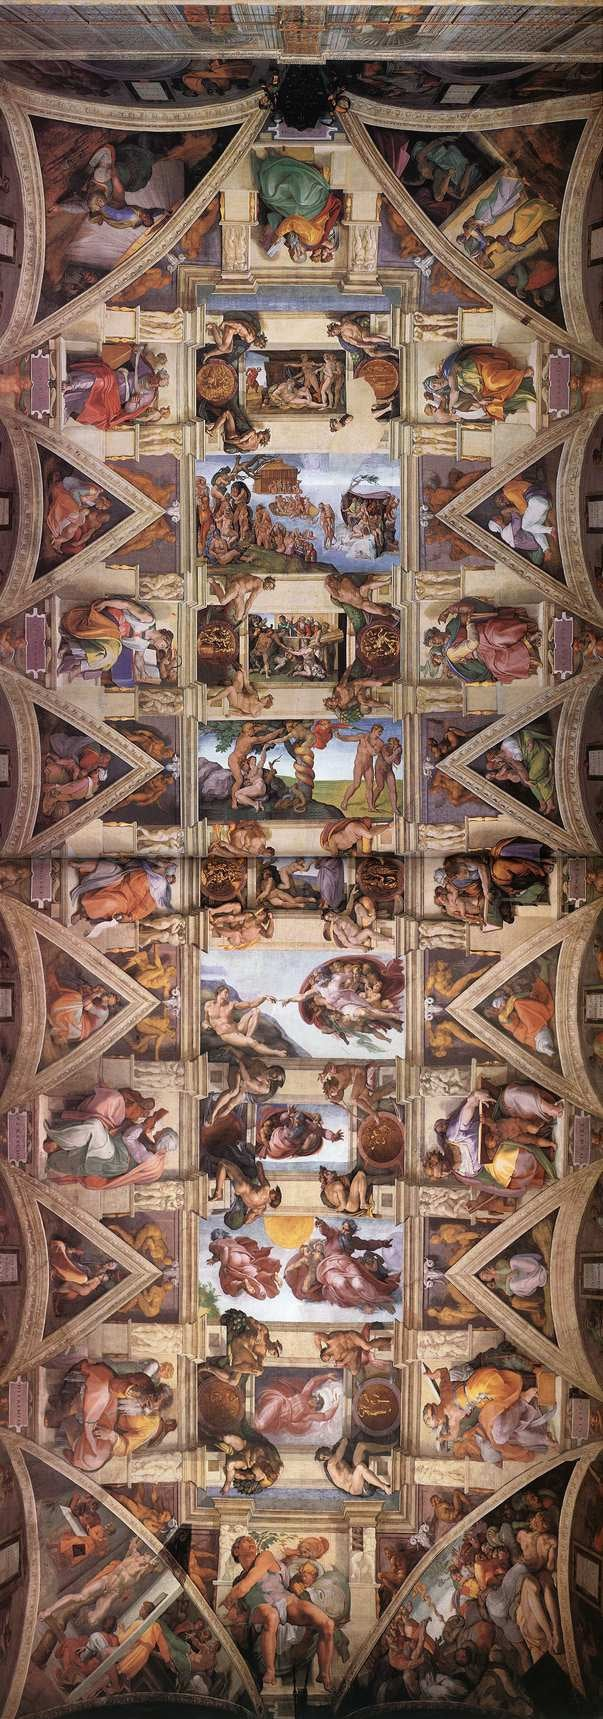 Michelangelo's Sistine Chapel ceiling (1508) in Vatican City